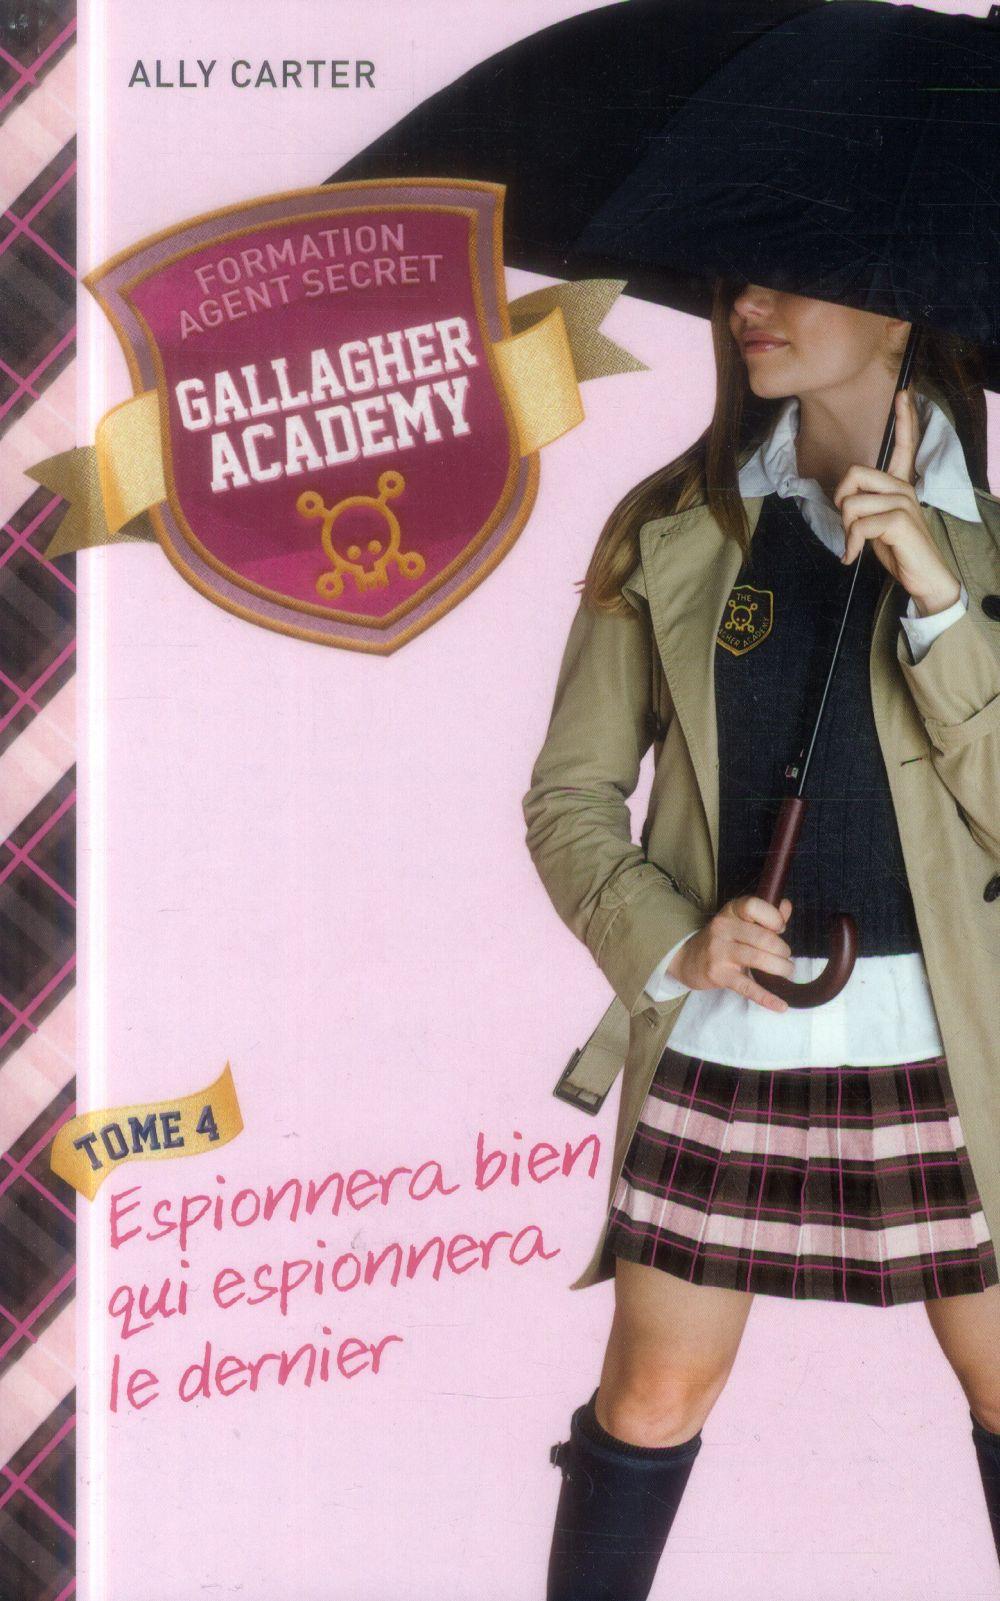 Gallagher Academy T.4 ; espionnera bien qui espionnera le dernier